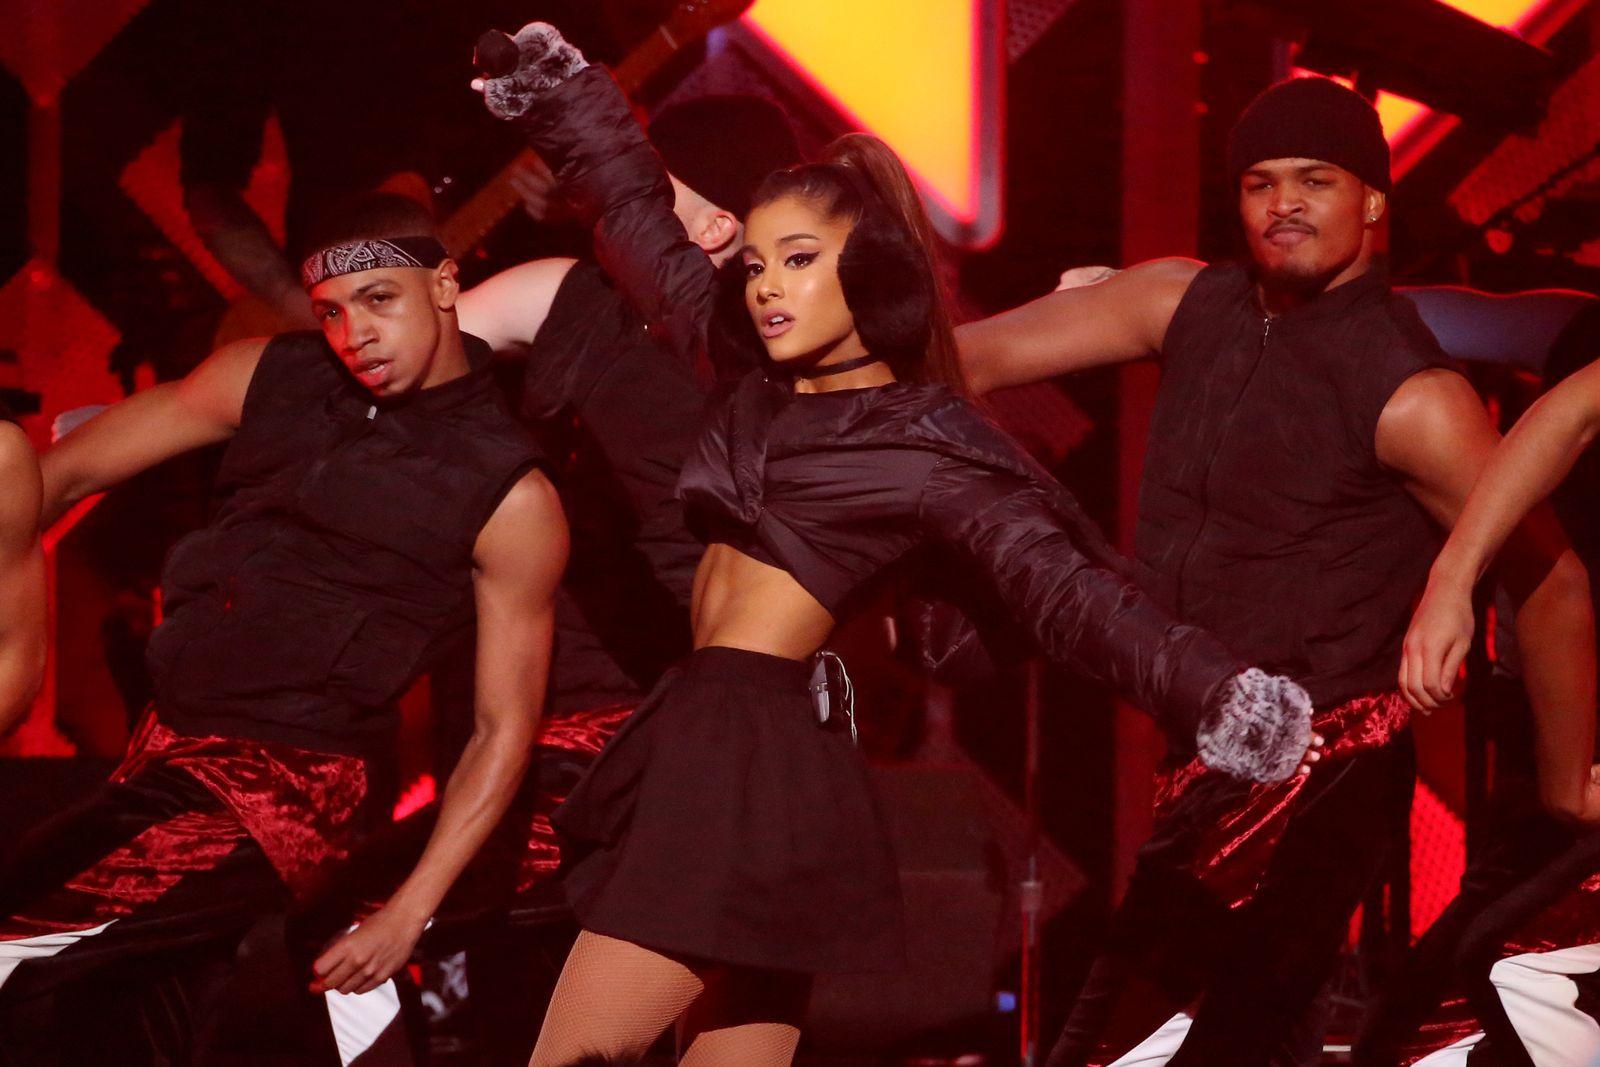 EINMALIGE VERWENDUNG EINMALIGE VERWENDUNG / Ariana Grande